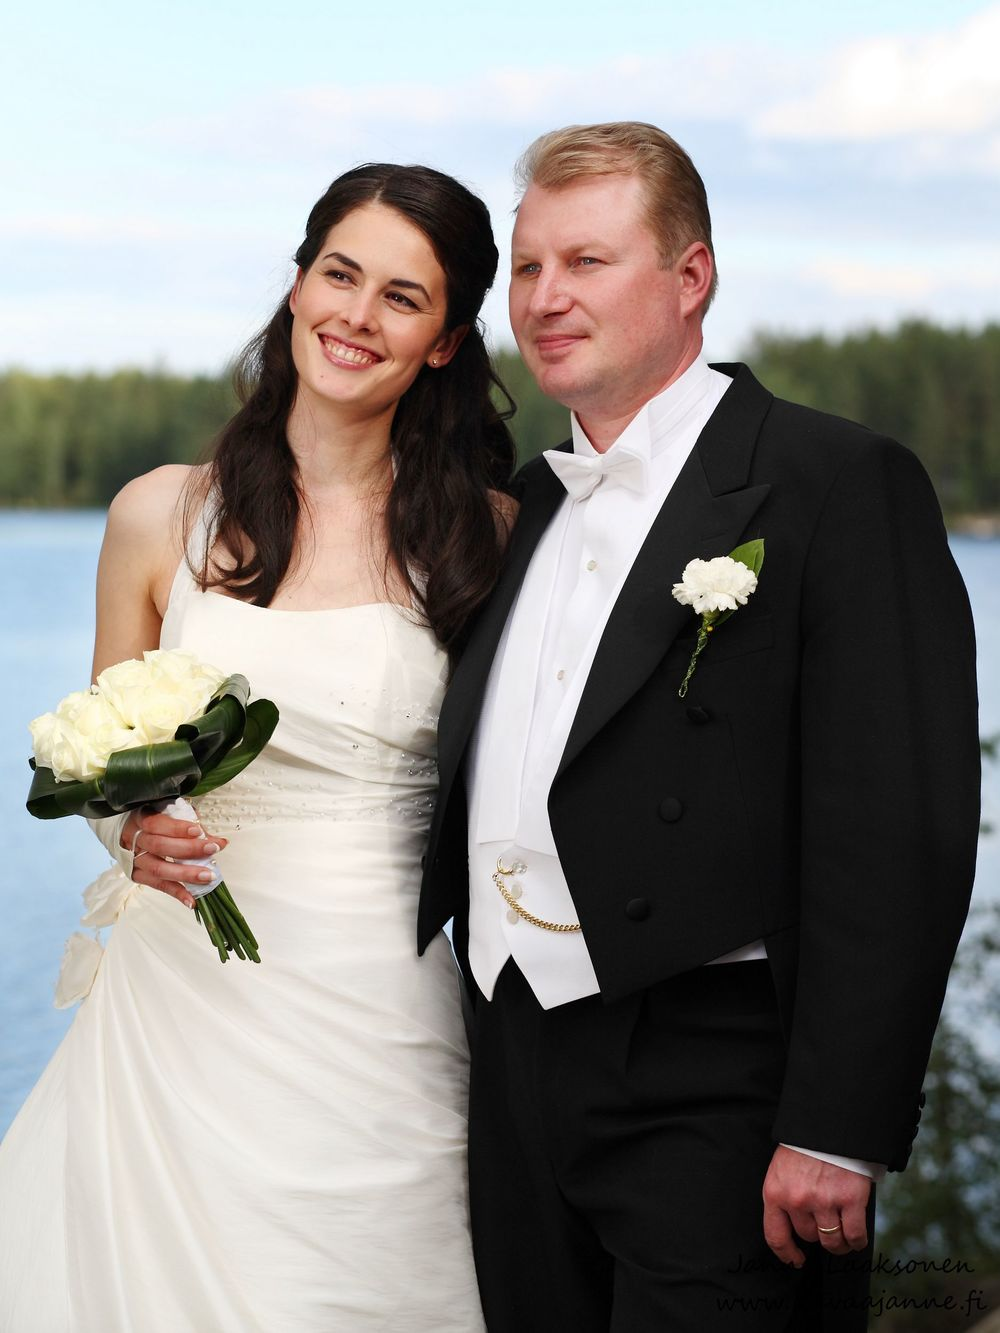 Hääpotretti Juupajoella.Valokuvaaja Janne Laaksonen, KuvaaJanne Ky, Riihimäki